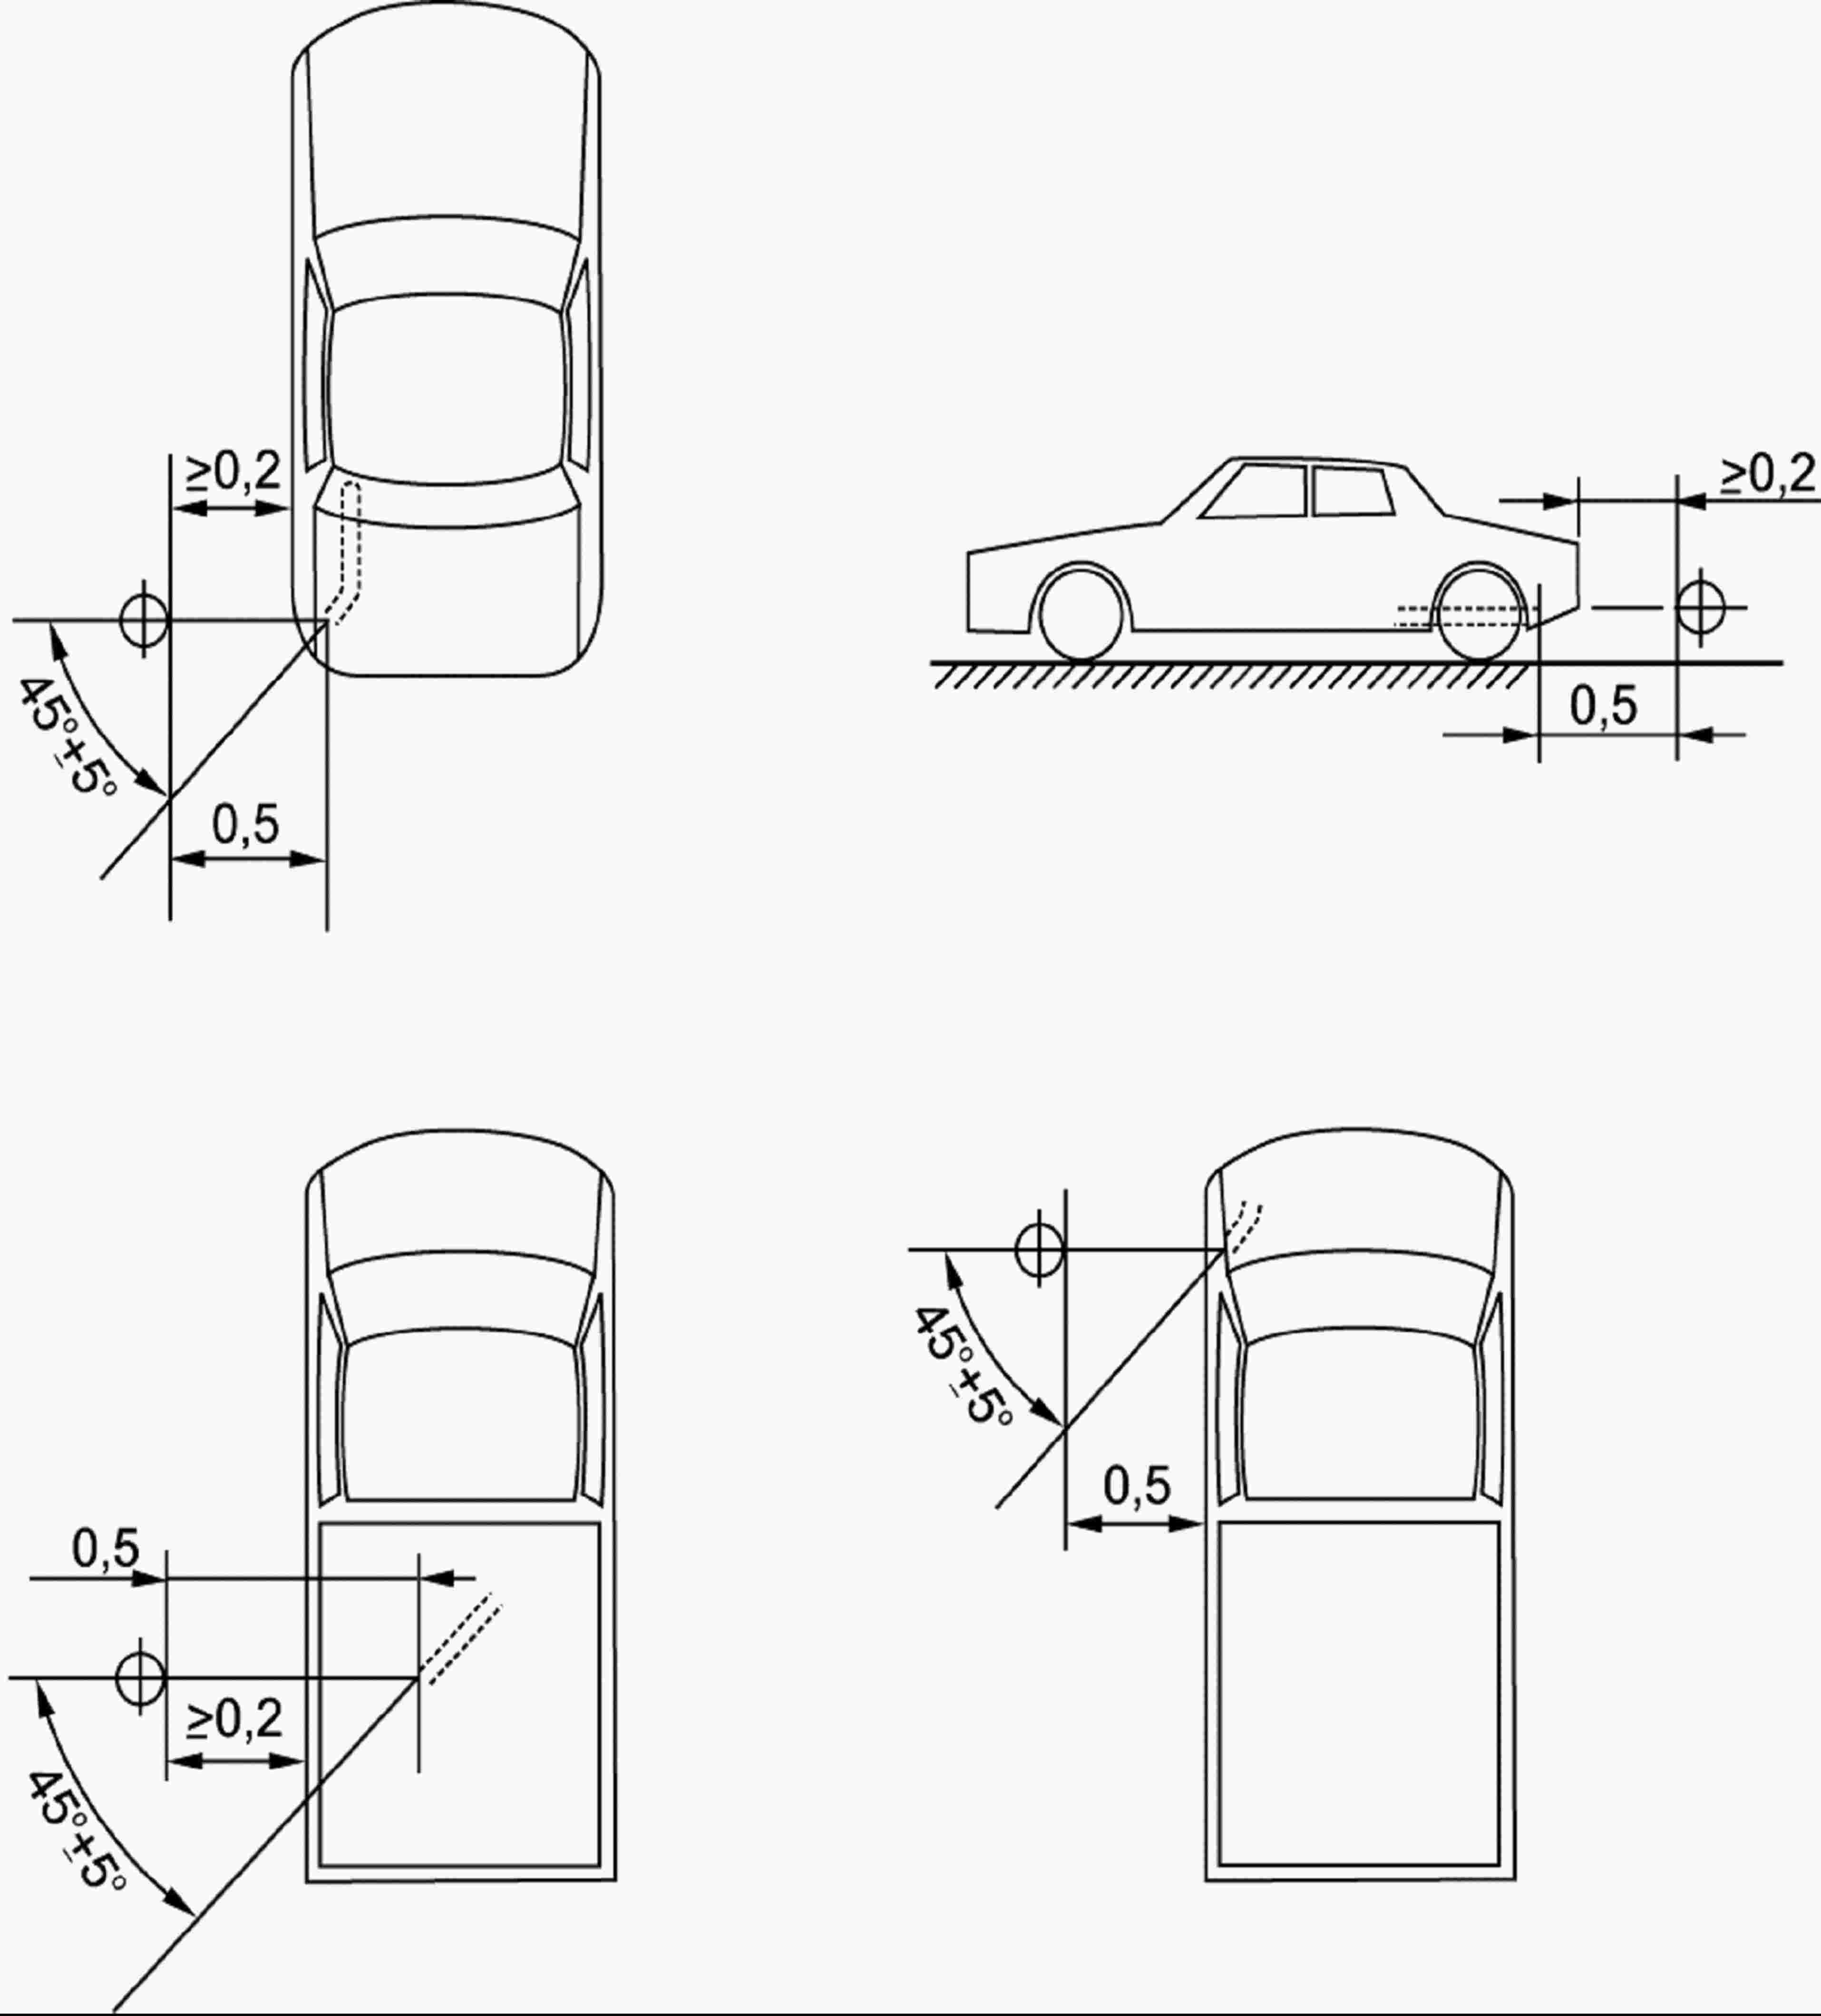 Eur Lex 32014r0540 En Parts Diagram Moreover Simple Car Engine Besides Labeled Image